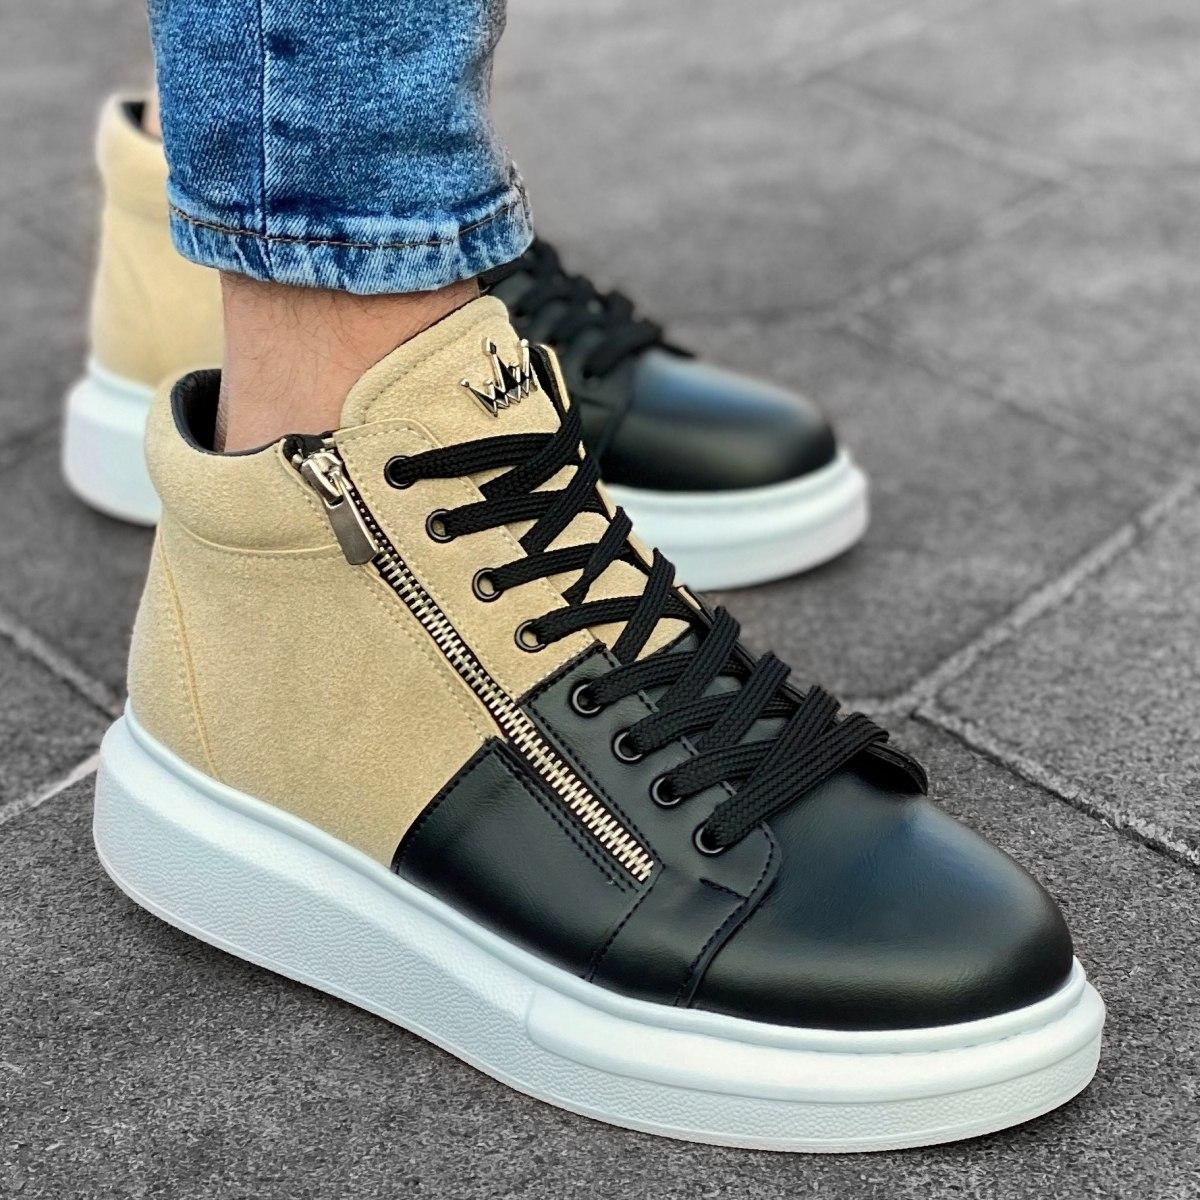 Homem Cano Alto Sneakers Designer Zip Basket Creme-Preto